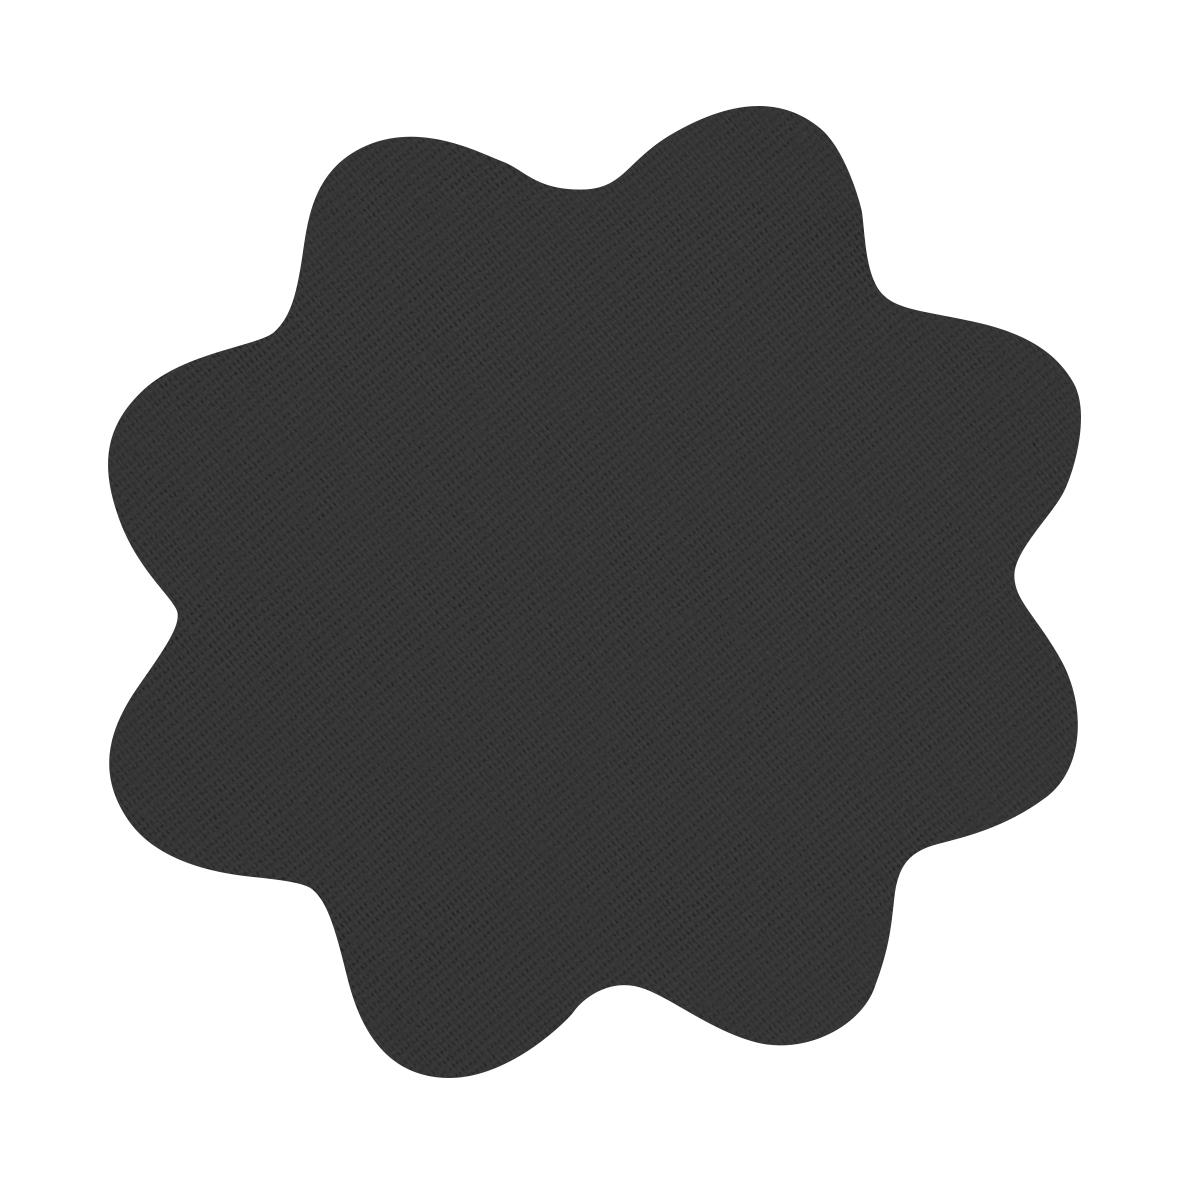 sparpack 10 1 fixtape blume schwarz h2o extra wasserfest zuckerschmuck. Black Bedroom Furniture Sets. Home Design Ideas